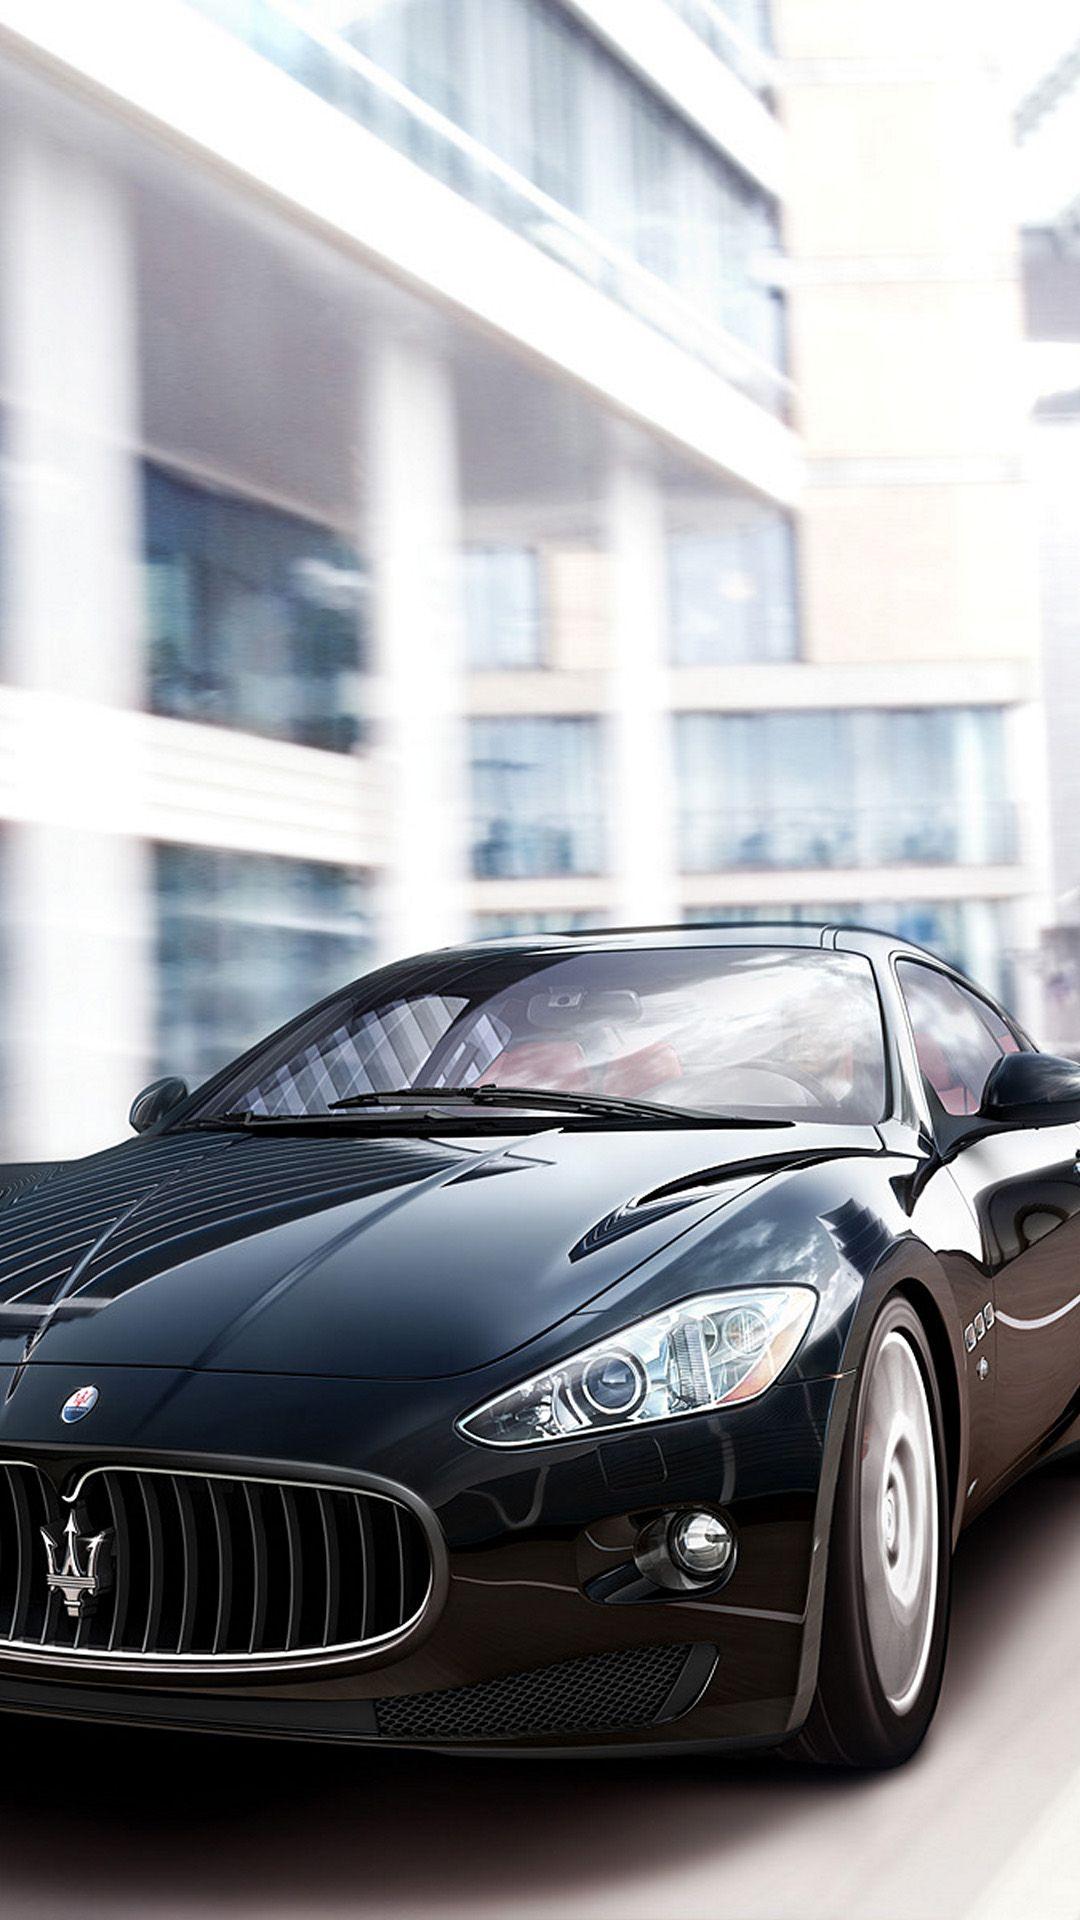 Maserati Granturismo S Black Best Htc One Wallpapers Maserati Granturismo Maserati Car Maserati Granturismo S